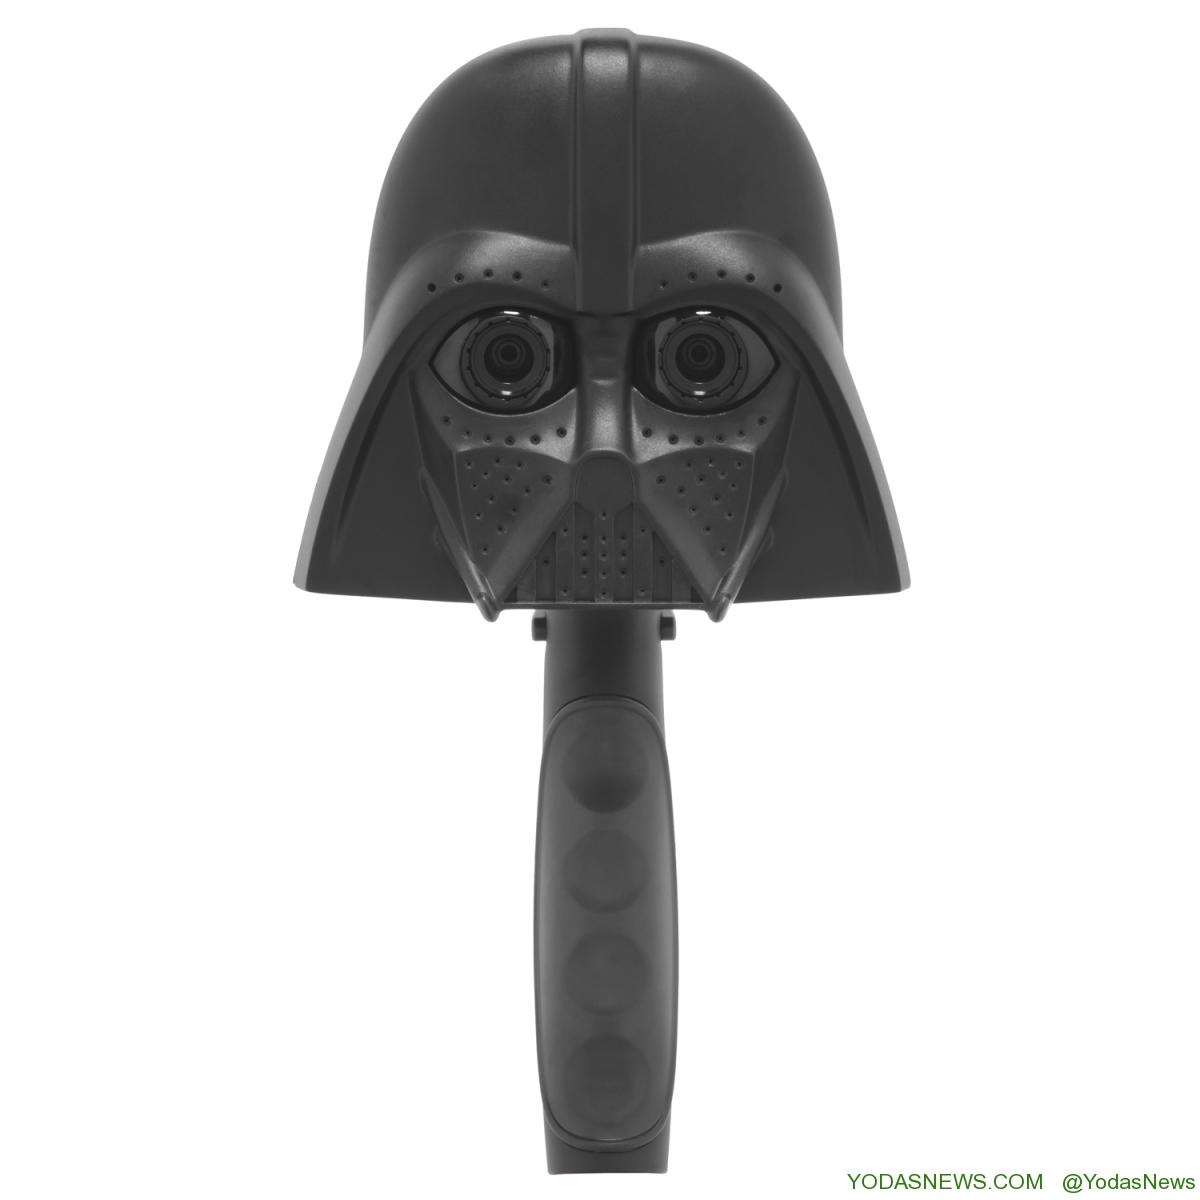 Darth Vader HH 74151 Packaging 01. Darth Vader HH 74151 Packaging 02.  Darth Vader HH 74151 Packaging 03. Darth Vader HH Front.  Darth Vader HH Front wHolder e79e9b425f